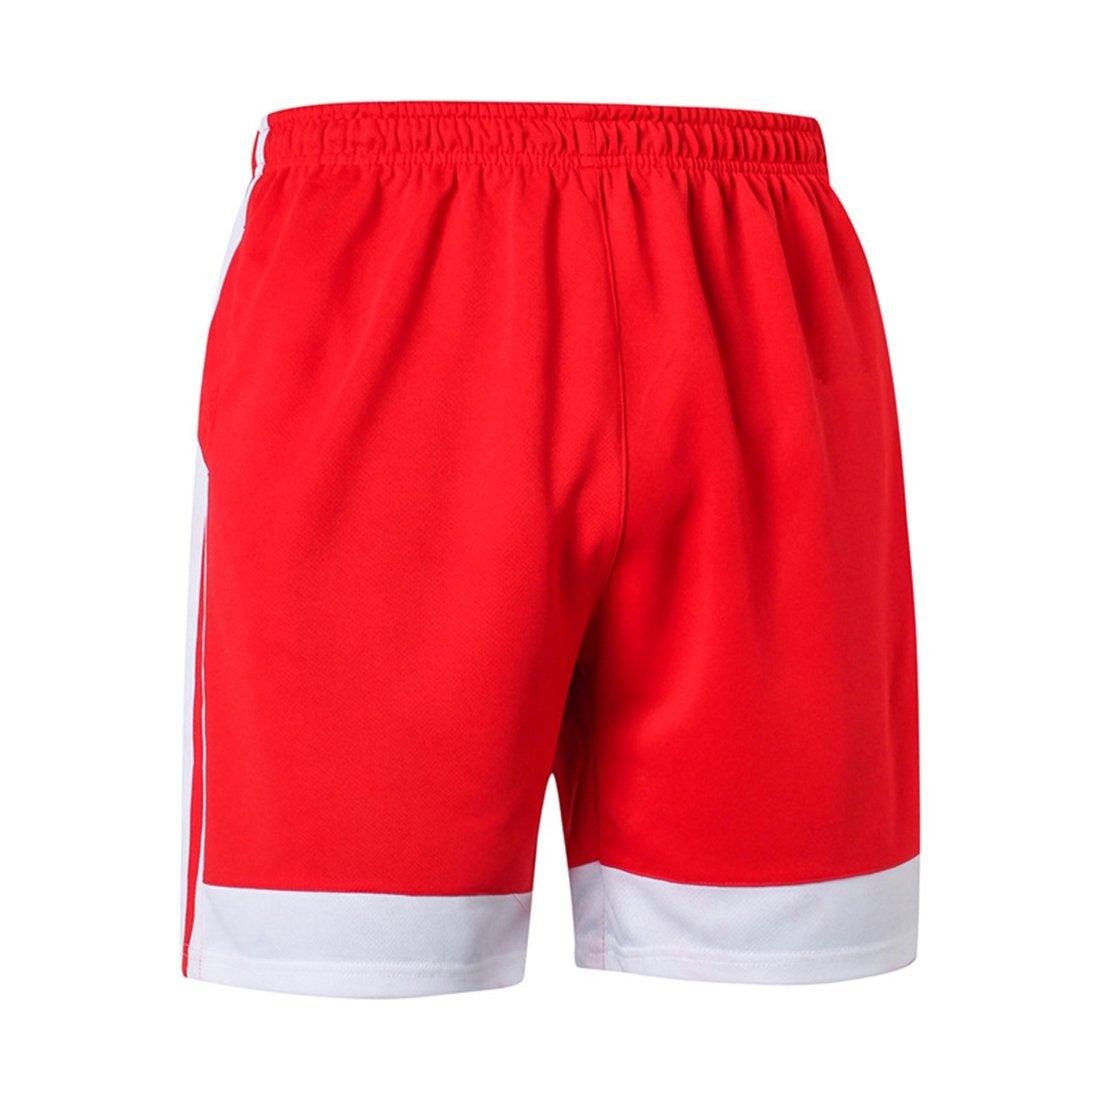 sevenwellメンズルーズフィットパフォーマンスショーツクイックドライRunningメッシュショーツジムワークアウトショーツ B07C4XF5V5 XL=US L|Red&White Red&White XL=US L